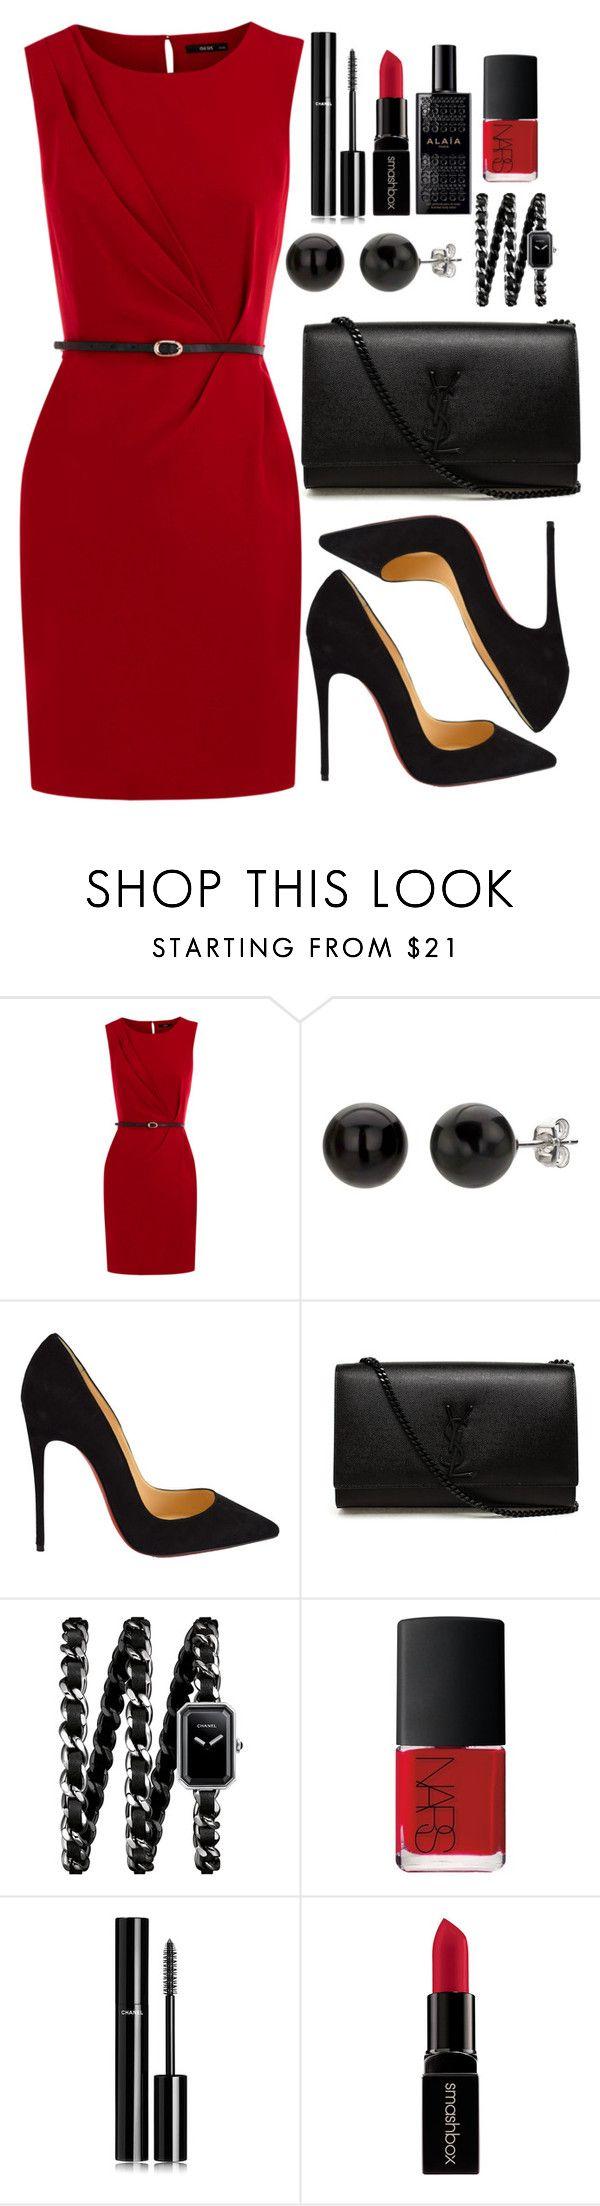 """Untitled #3520"" by natalyasidunova ❤ liked on Polyvore featuring Oasis, Christian Louboutin, Yves Saint Laurent, Chanel, NARS Cosmetics, Smashbox, Alaïa, women's clothing, women's fashion and women"